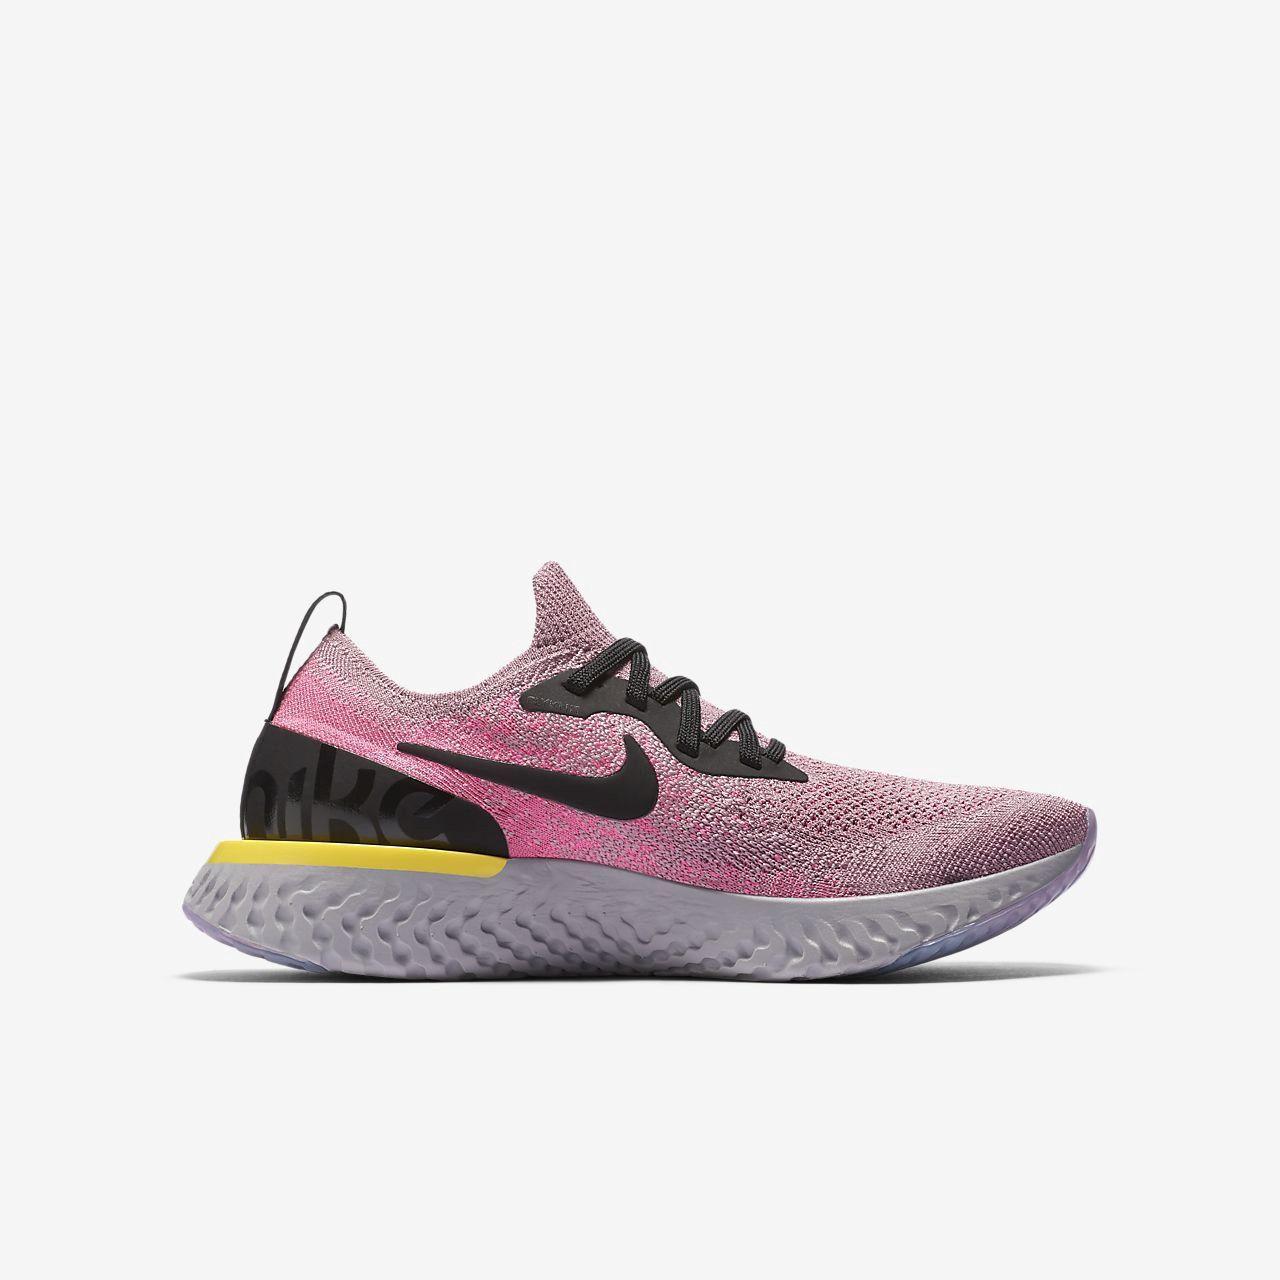 Nike Epic React Flyknit Big Kids' Running Shoe 5.5Y